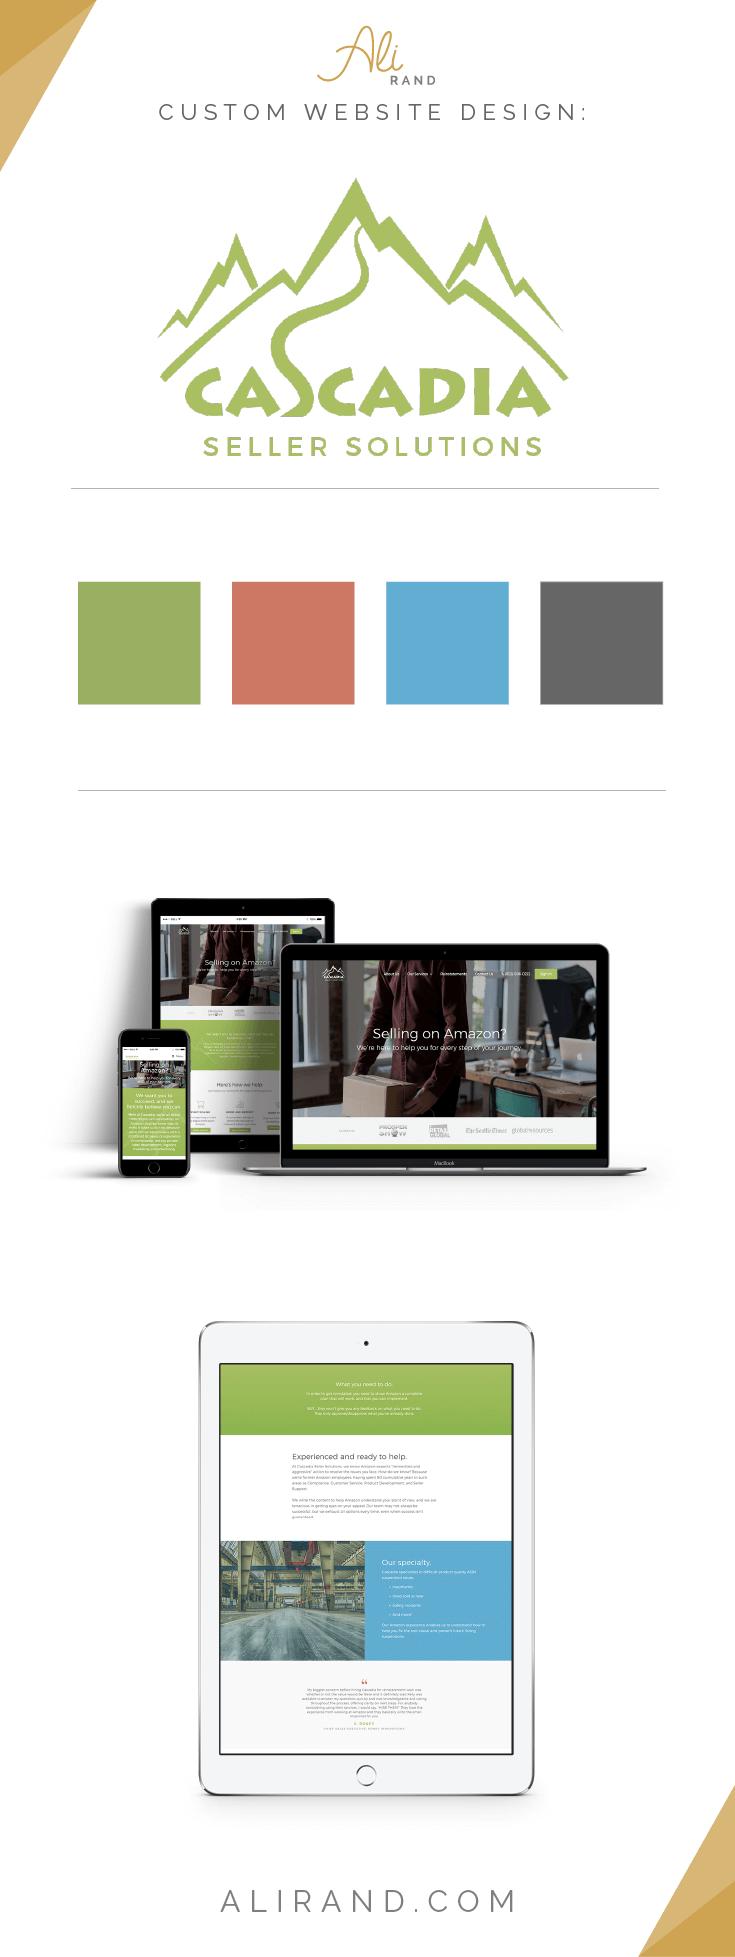 Cascadia Seller Solutions custom website design project by Ali Rand Websites